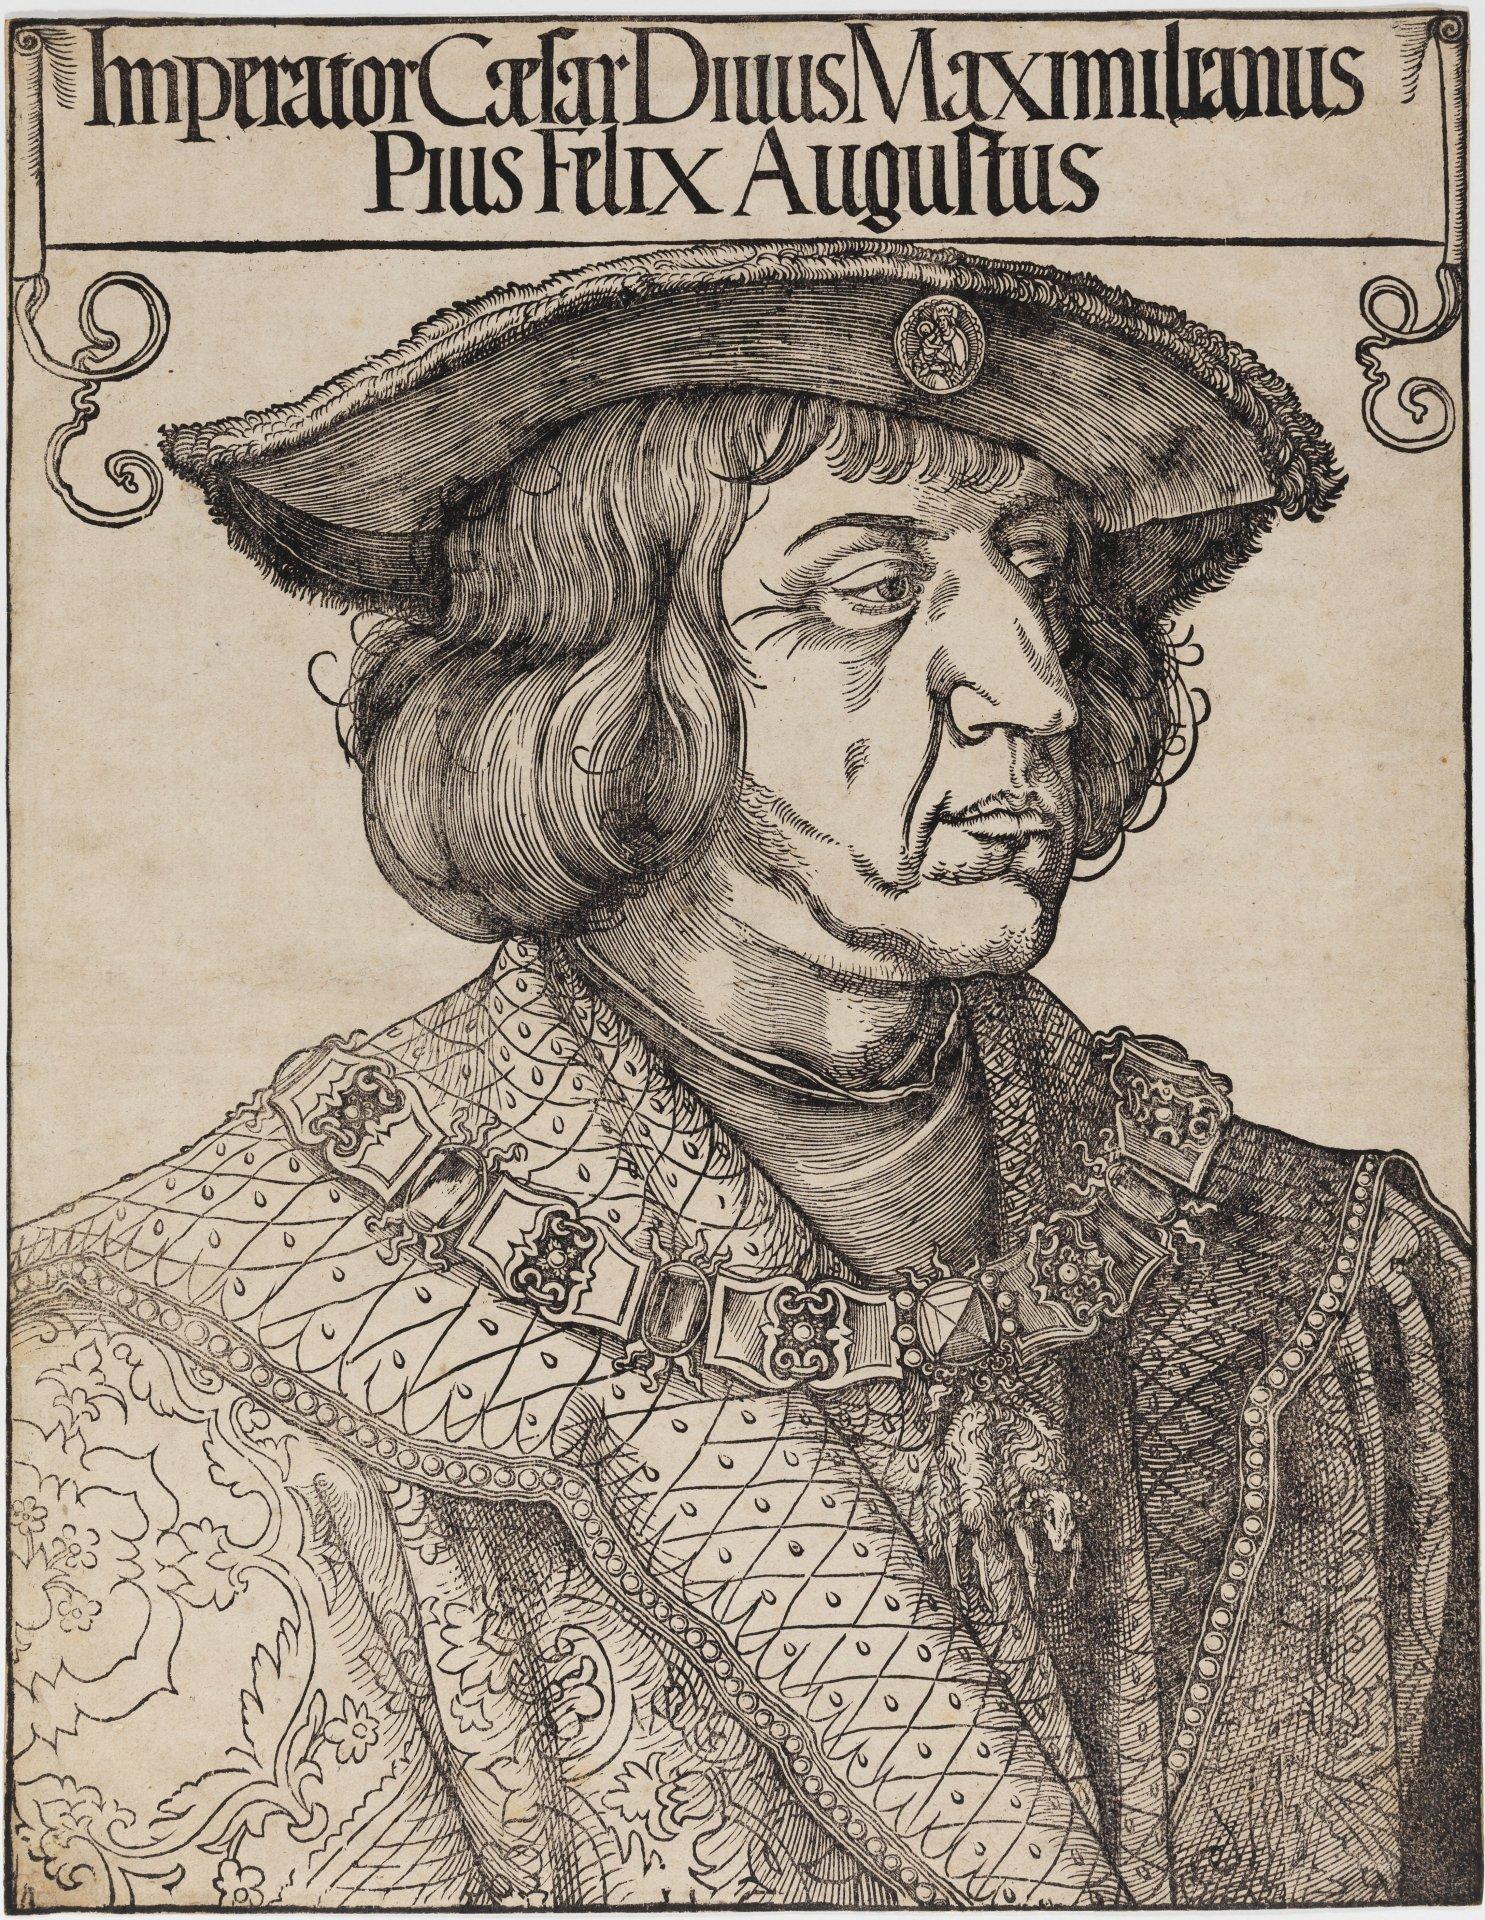 Abbildung des Werks Kaiser Maximilian I. des Renaissance-Künstlers Albrecht Dürers aus dem Jahr 1519